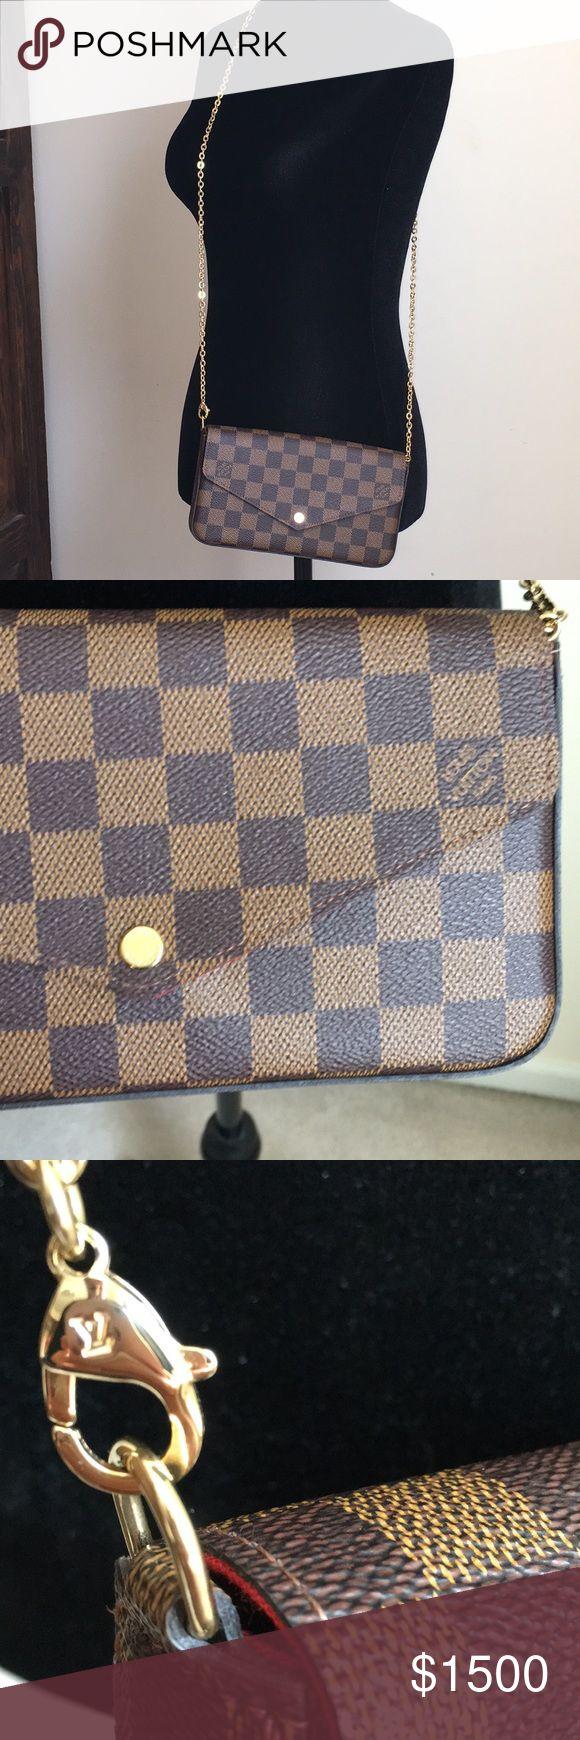 Louis Vuitton crossbody Felicie NWT 💯 authentic Louis Vuitton crossbody Felicie NWT 💯 authentic Louis Vuitton Bags Crossbody Bags